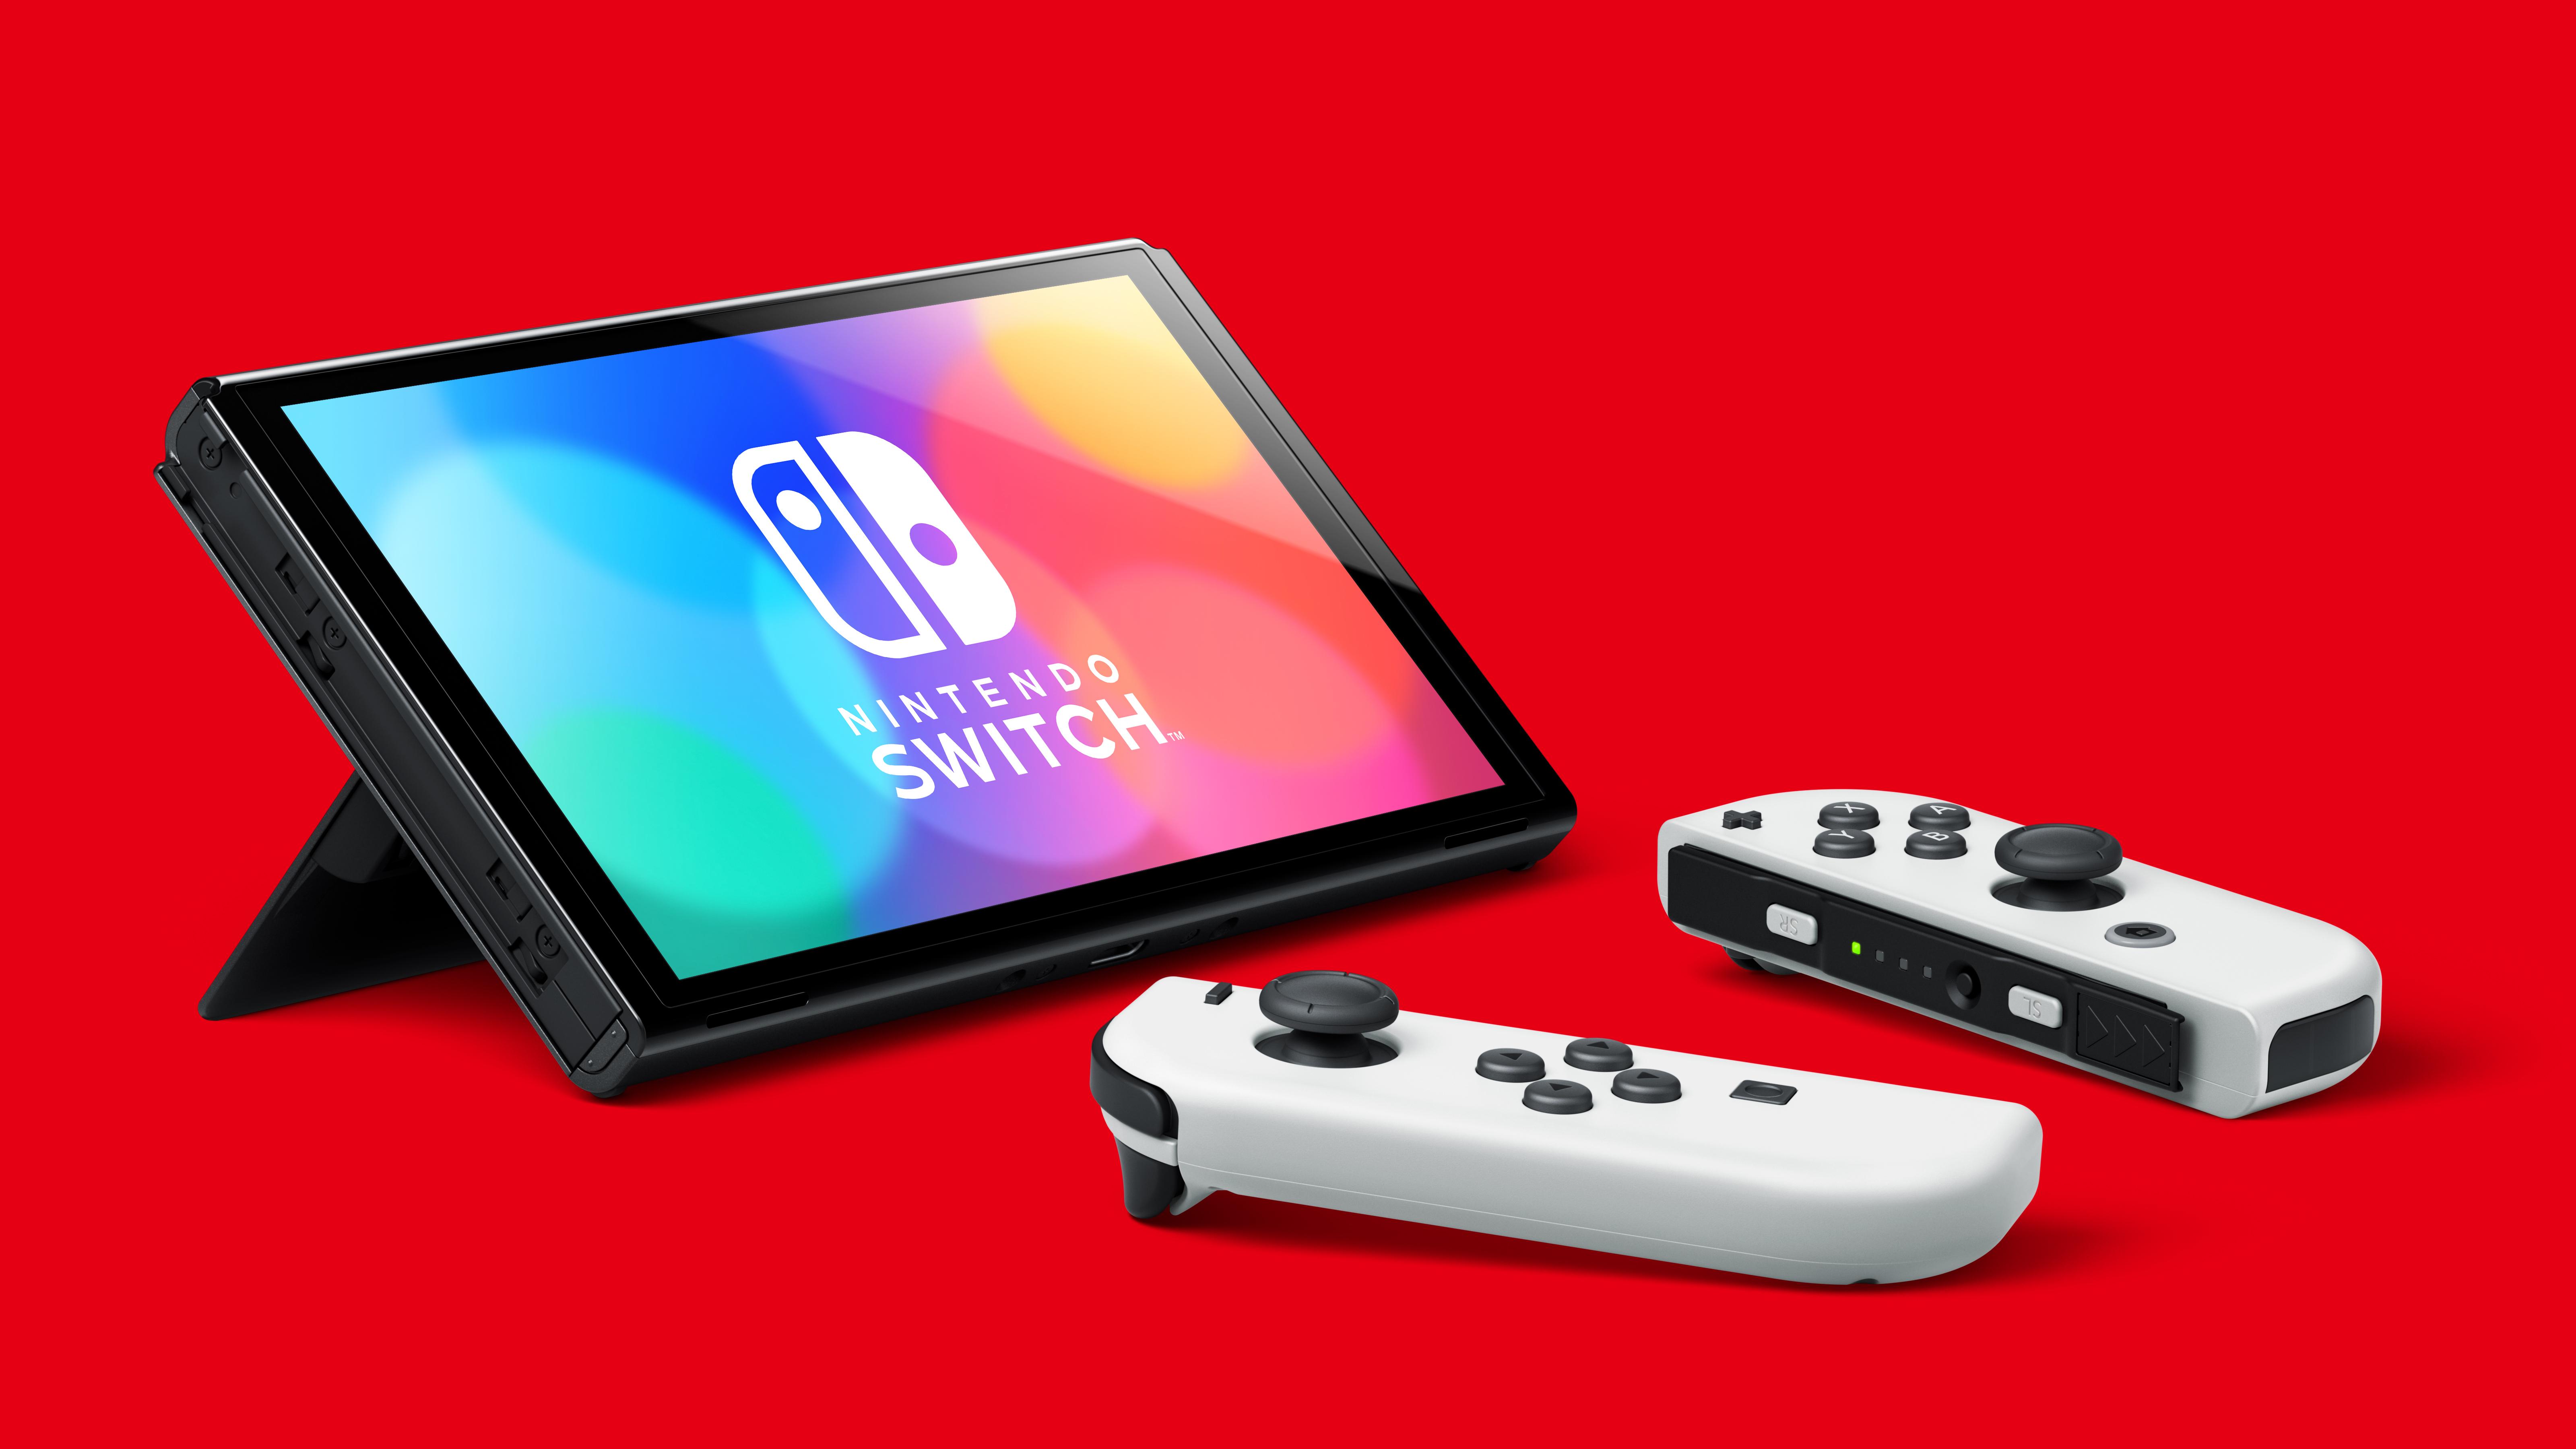 The new Nintendo Switch OLED model